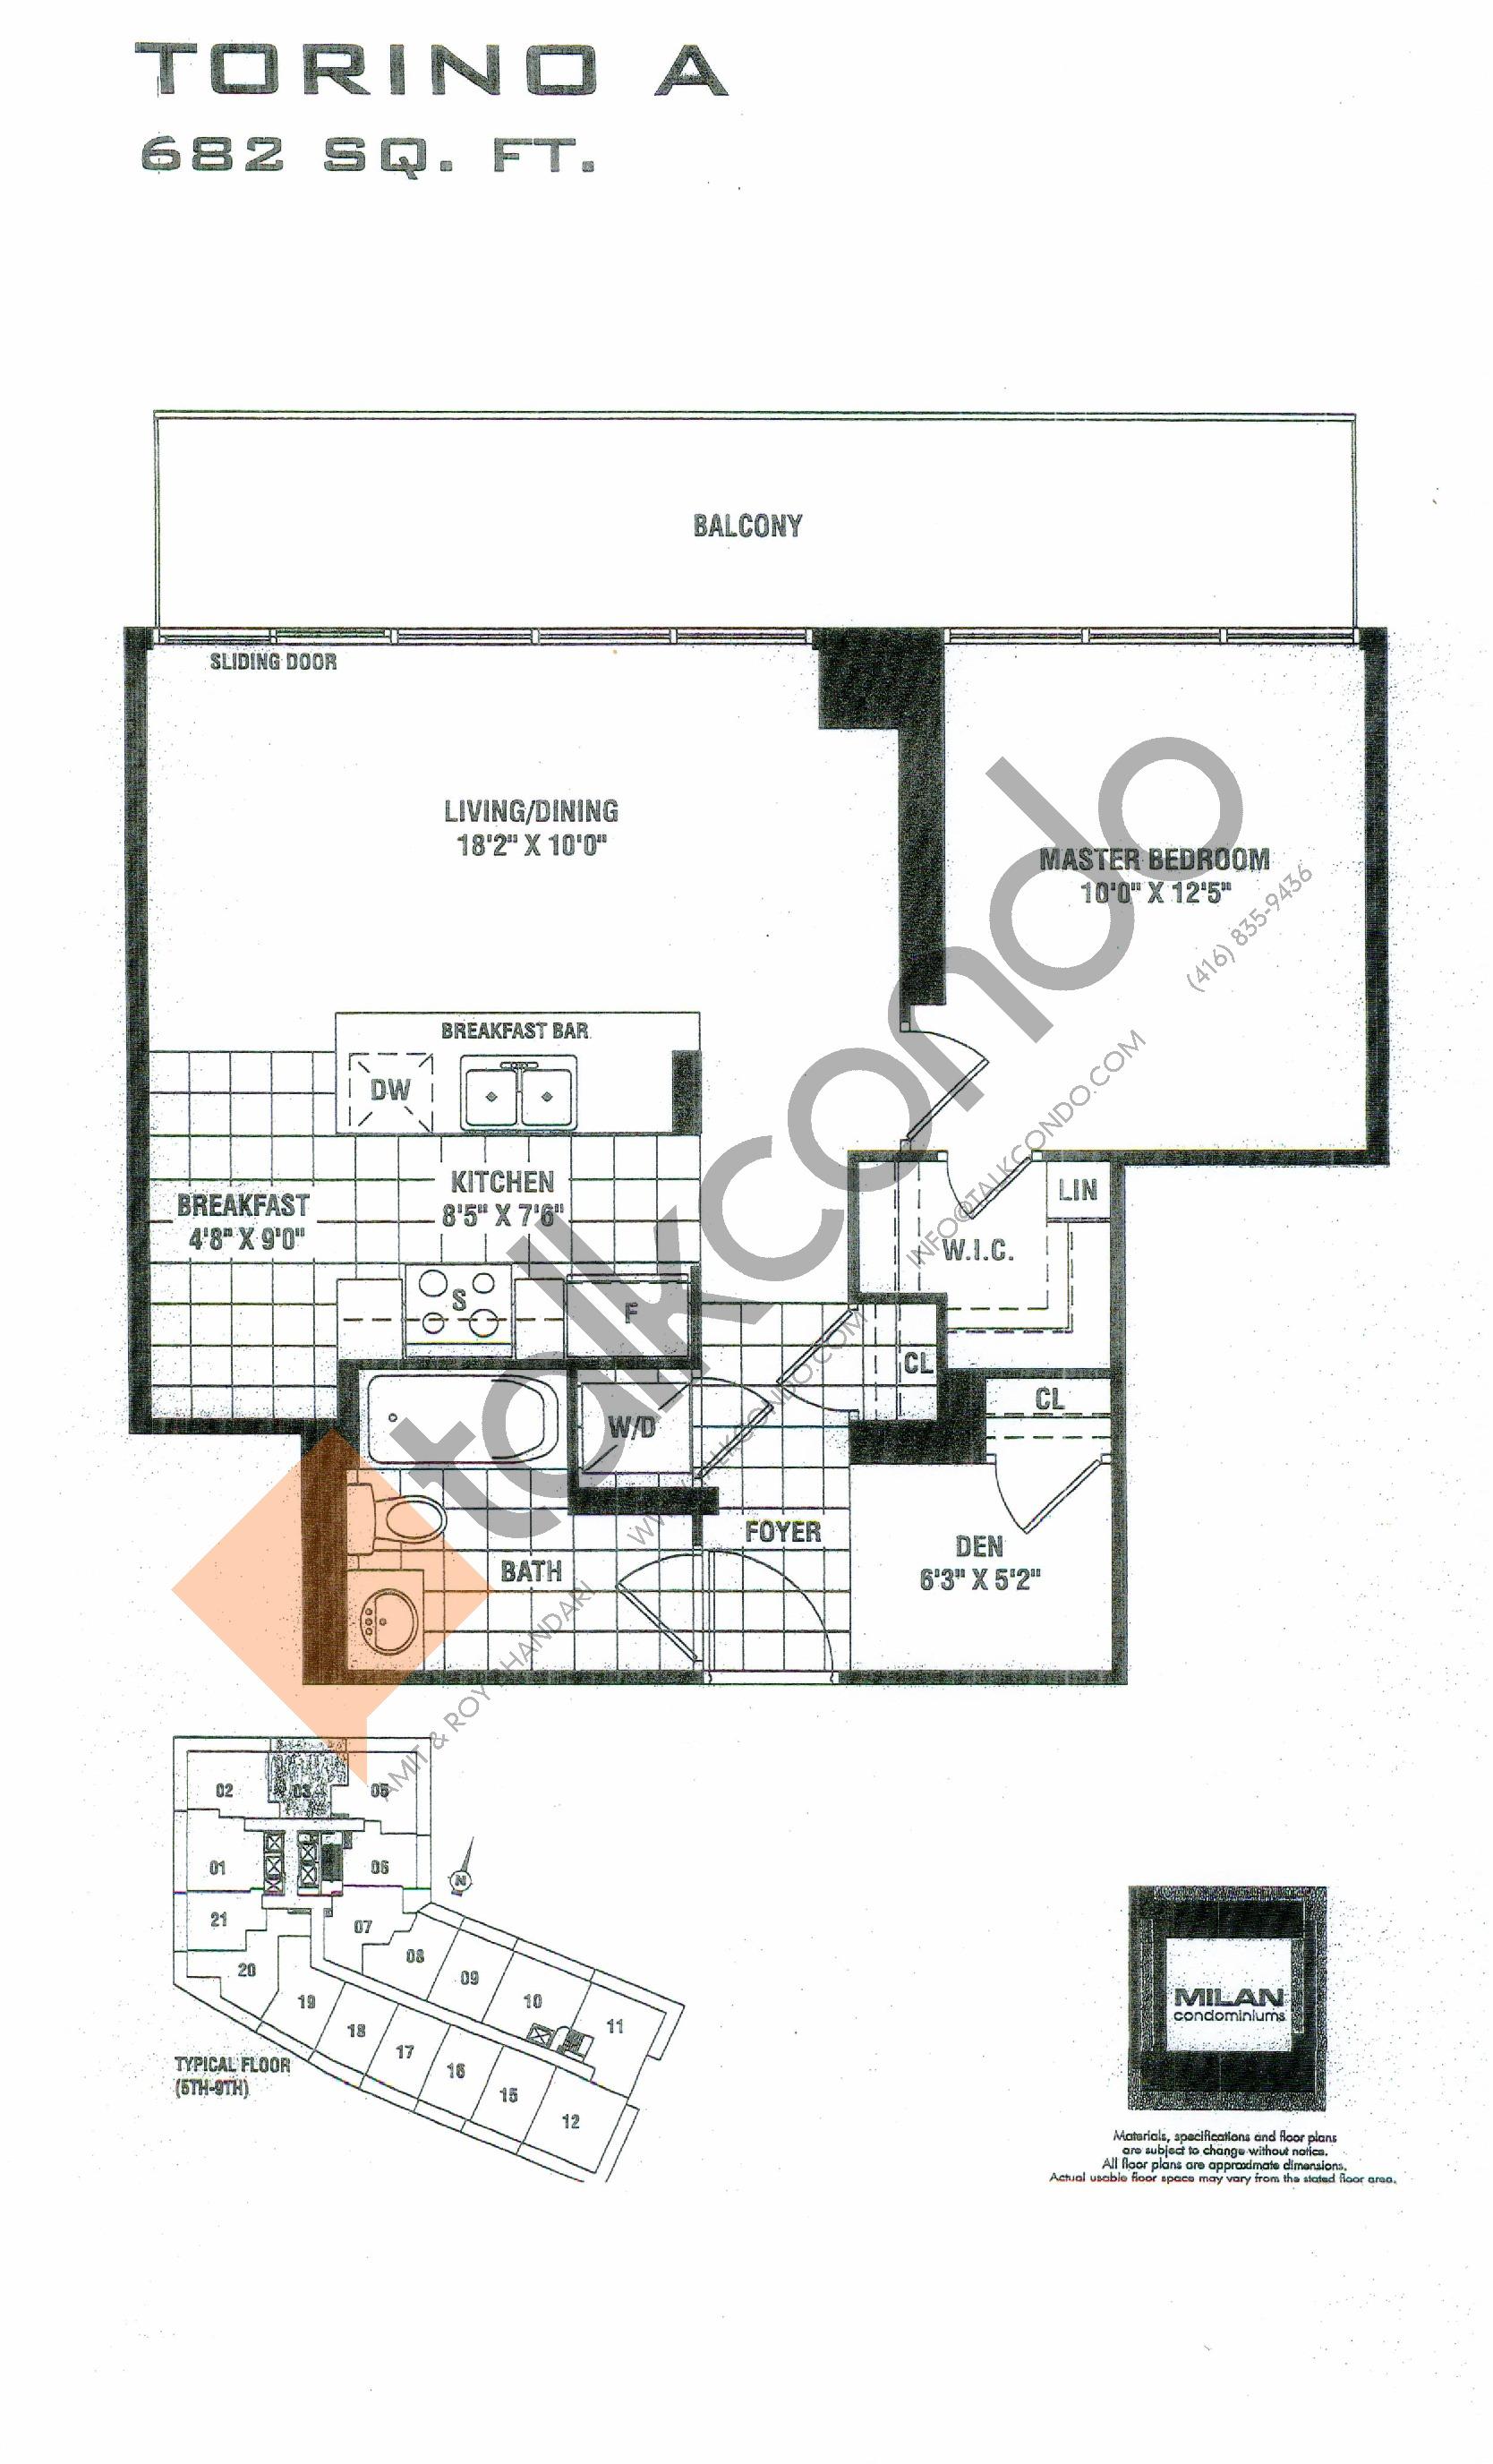 Torino A Floor Plan at Milan Condos - 682 sq.ft